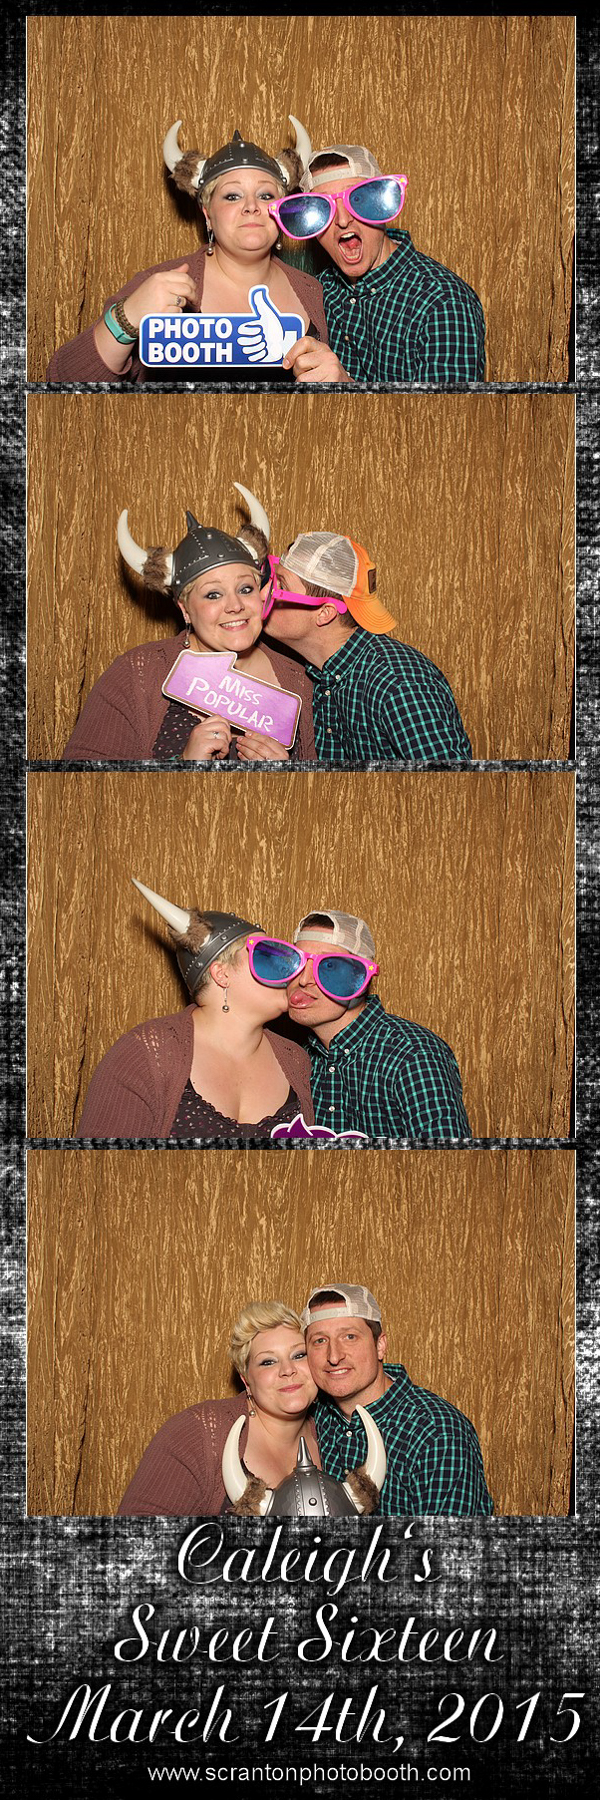 Scranton Photo Booth Rentals 570-877-2829 www.scrantonphotobooth.com #wedding #sweet16 #graduationparty #50thbithday #prom #semiformal